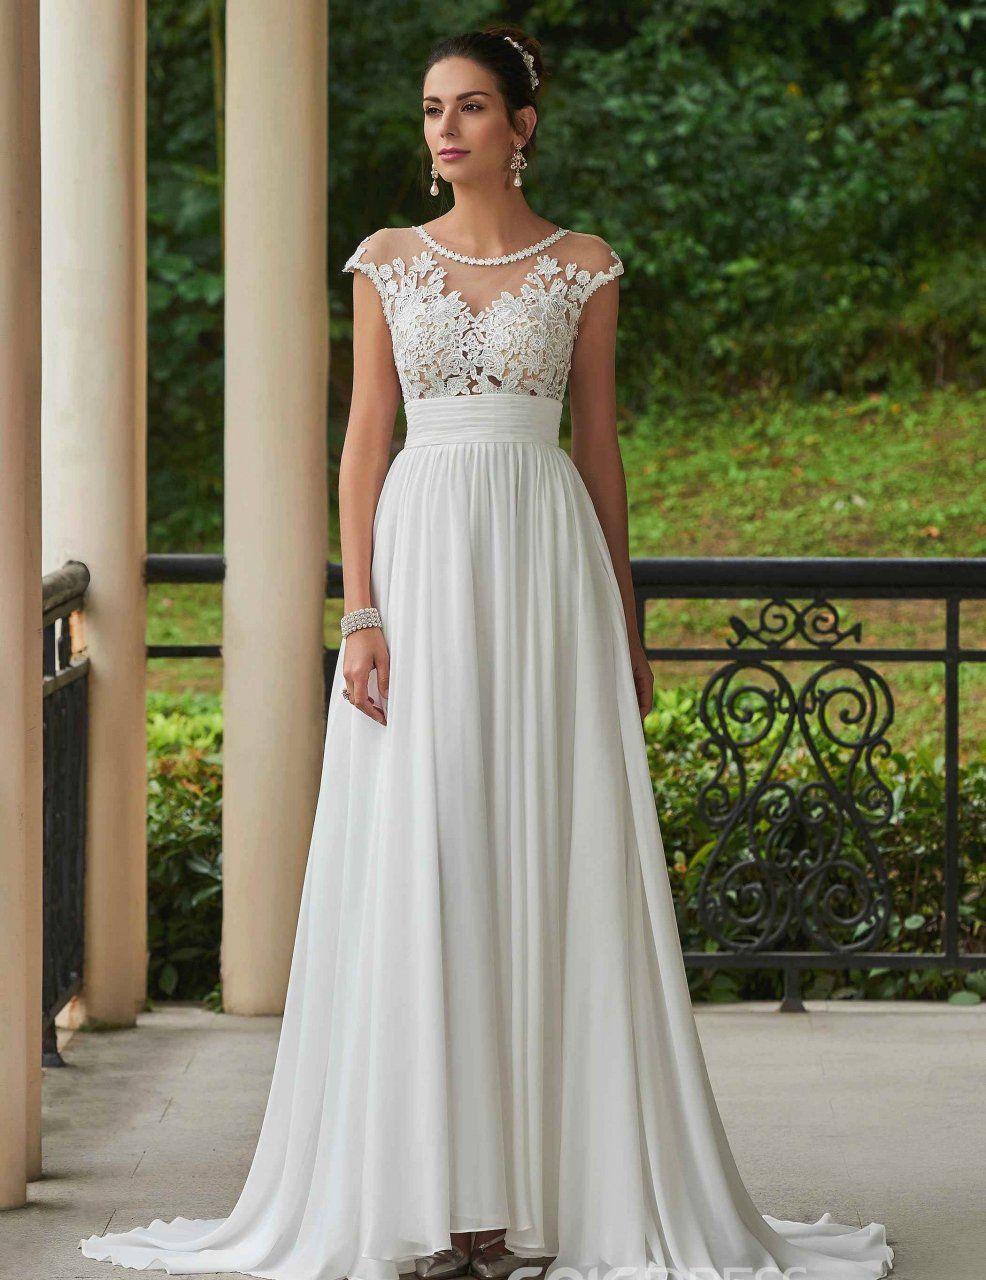 Wedding Dress Rental Las Vegas in 2020 Lace applique